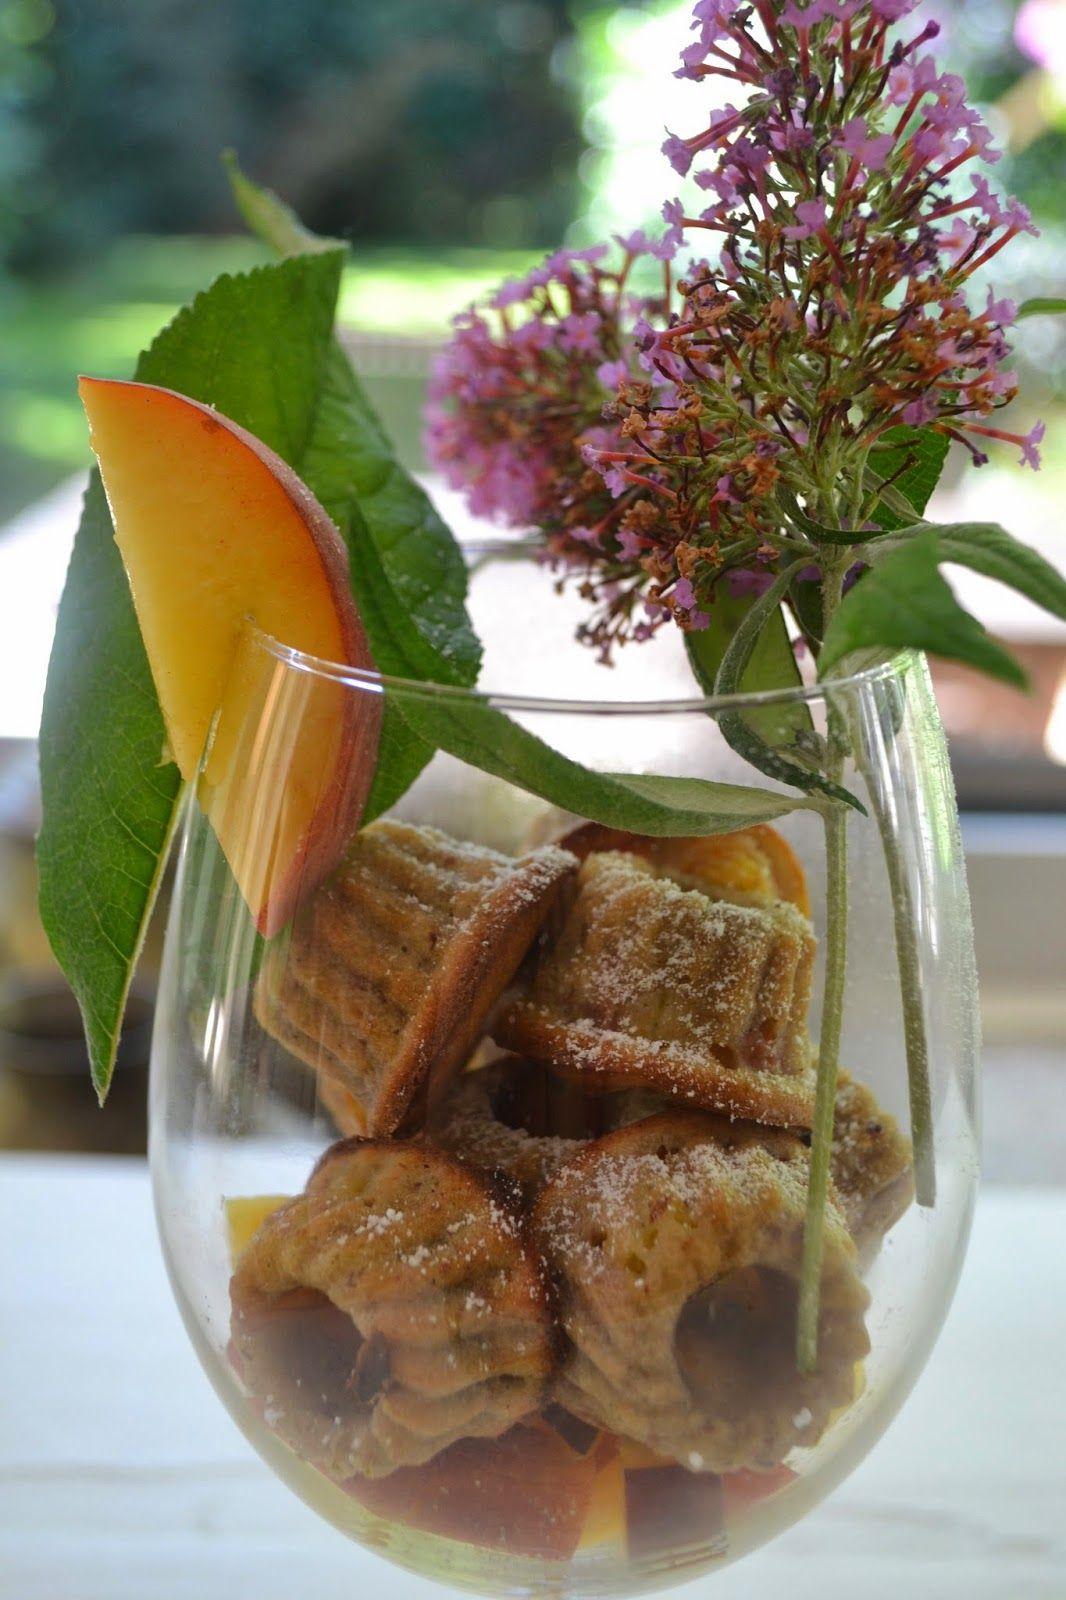 The Recipe Suitcase: Mini Pfirsich Gugl im Glas #ichbacksmir #gugl